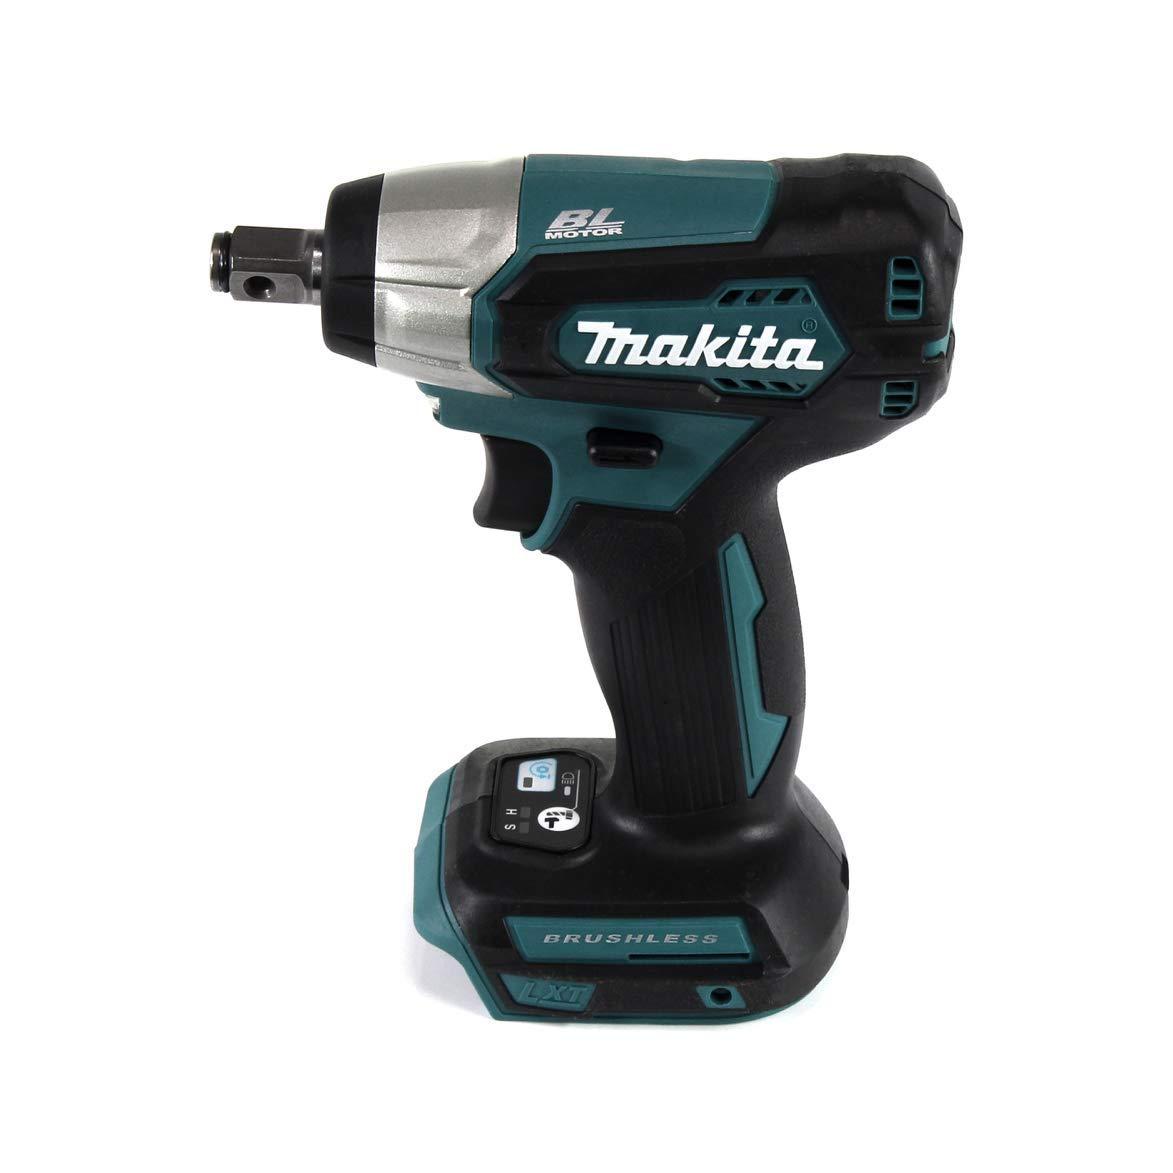 18 V Makita DTW181Z Impact Wrench